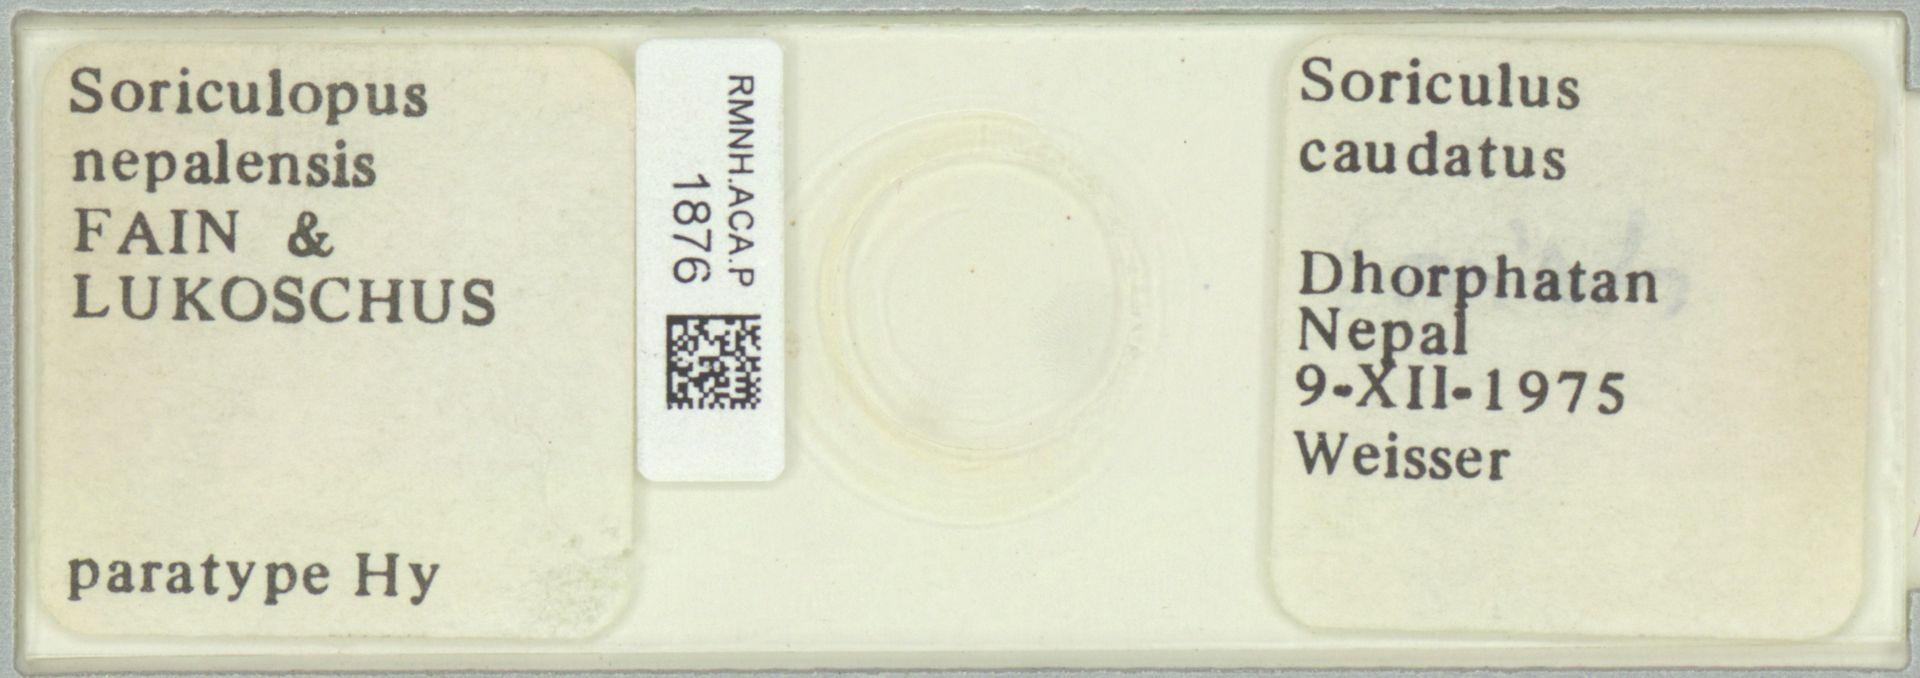 RMNH.ACA.P.1876 | Soriculops nepalensis Fain & Lukoschus